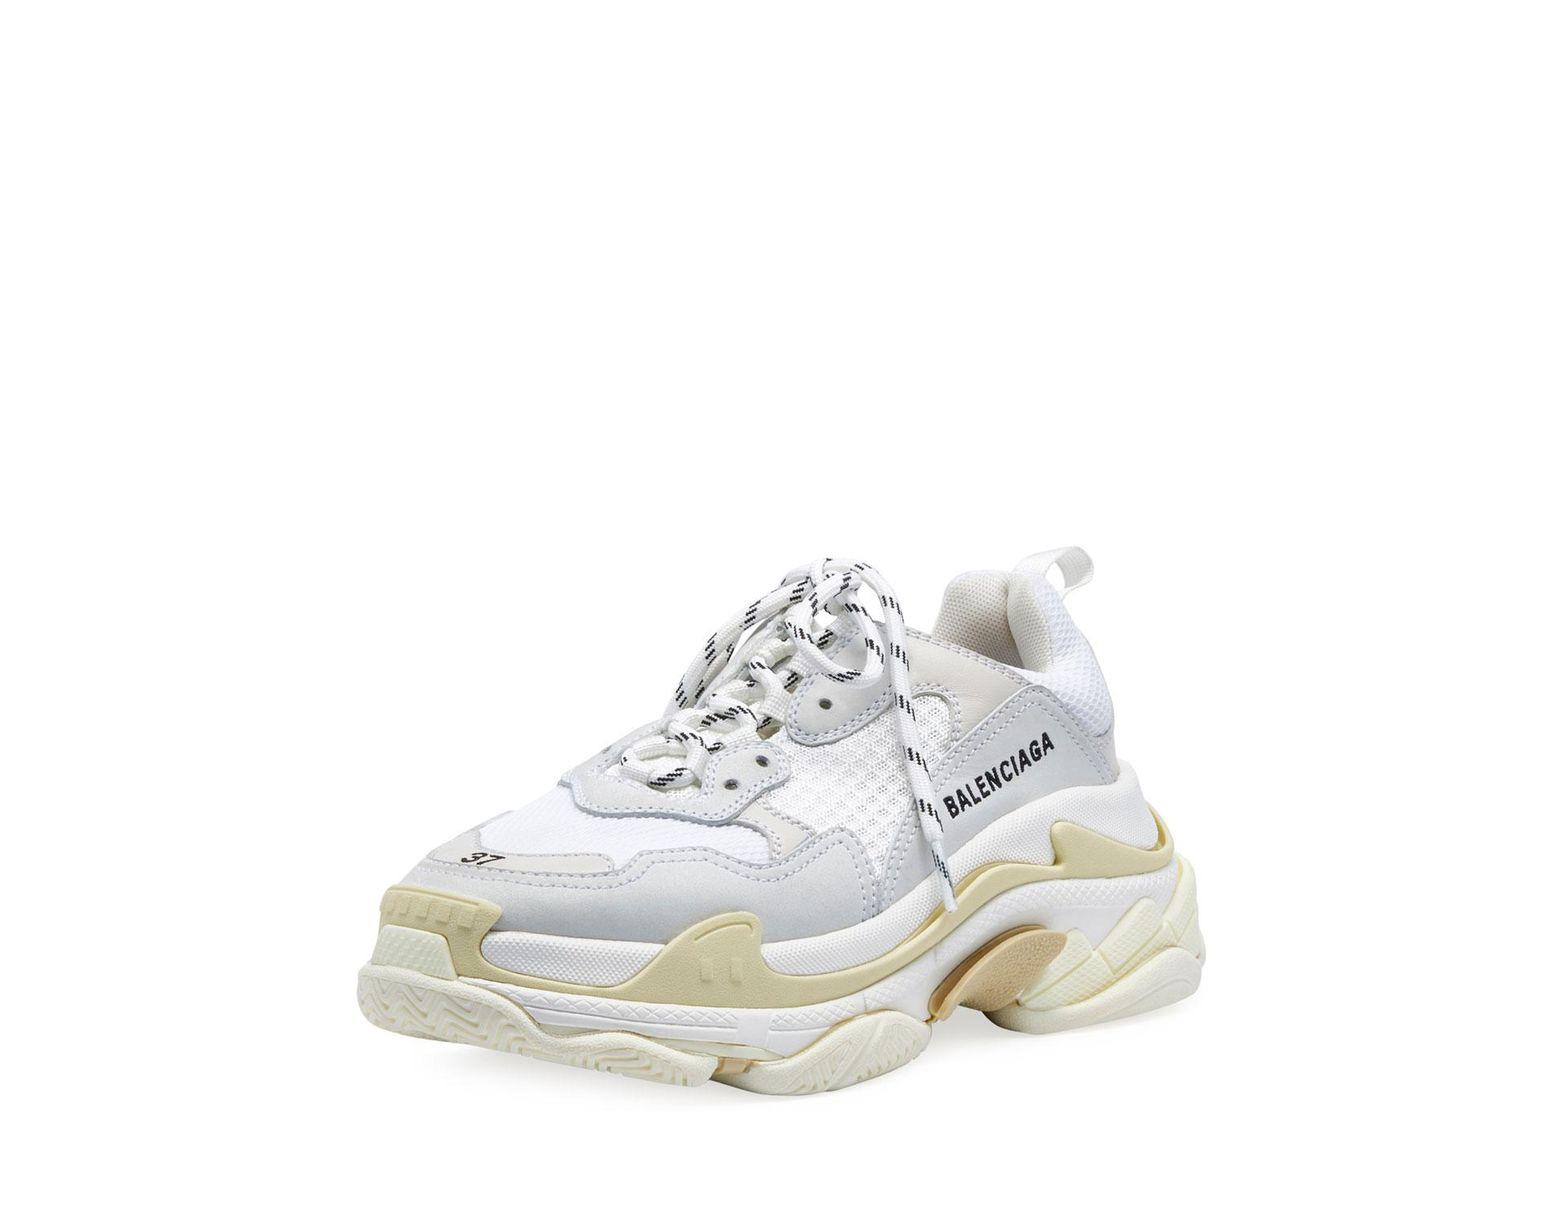 d3e4a575a46d Lyst - Balenciaga White Triple S Sneakers in White for Men